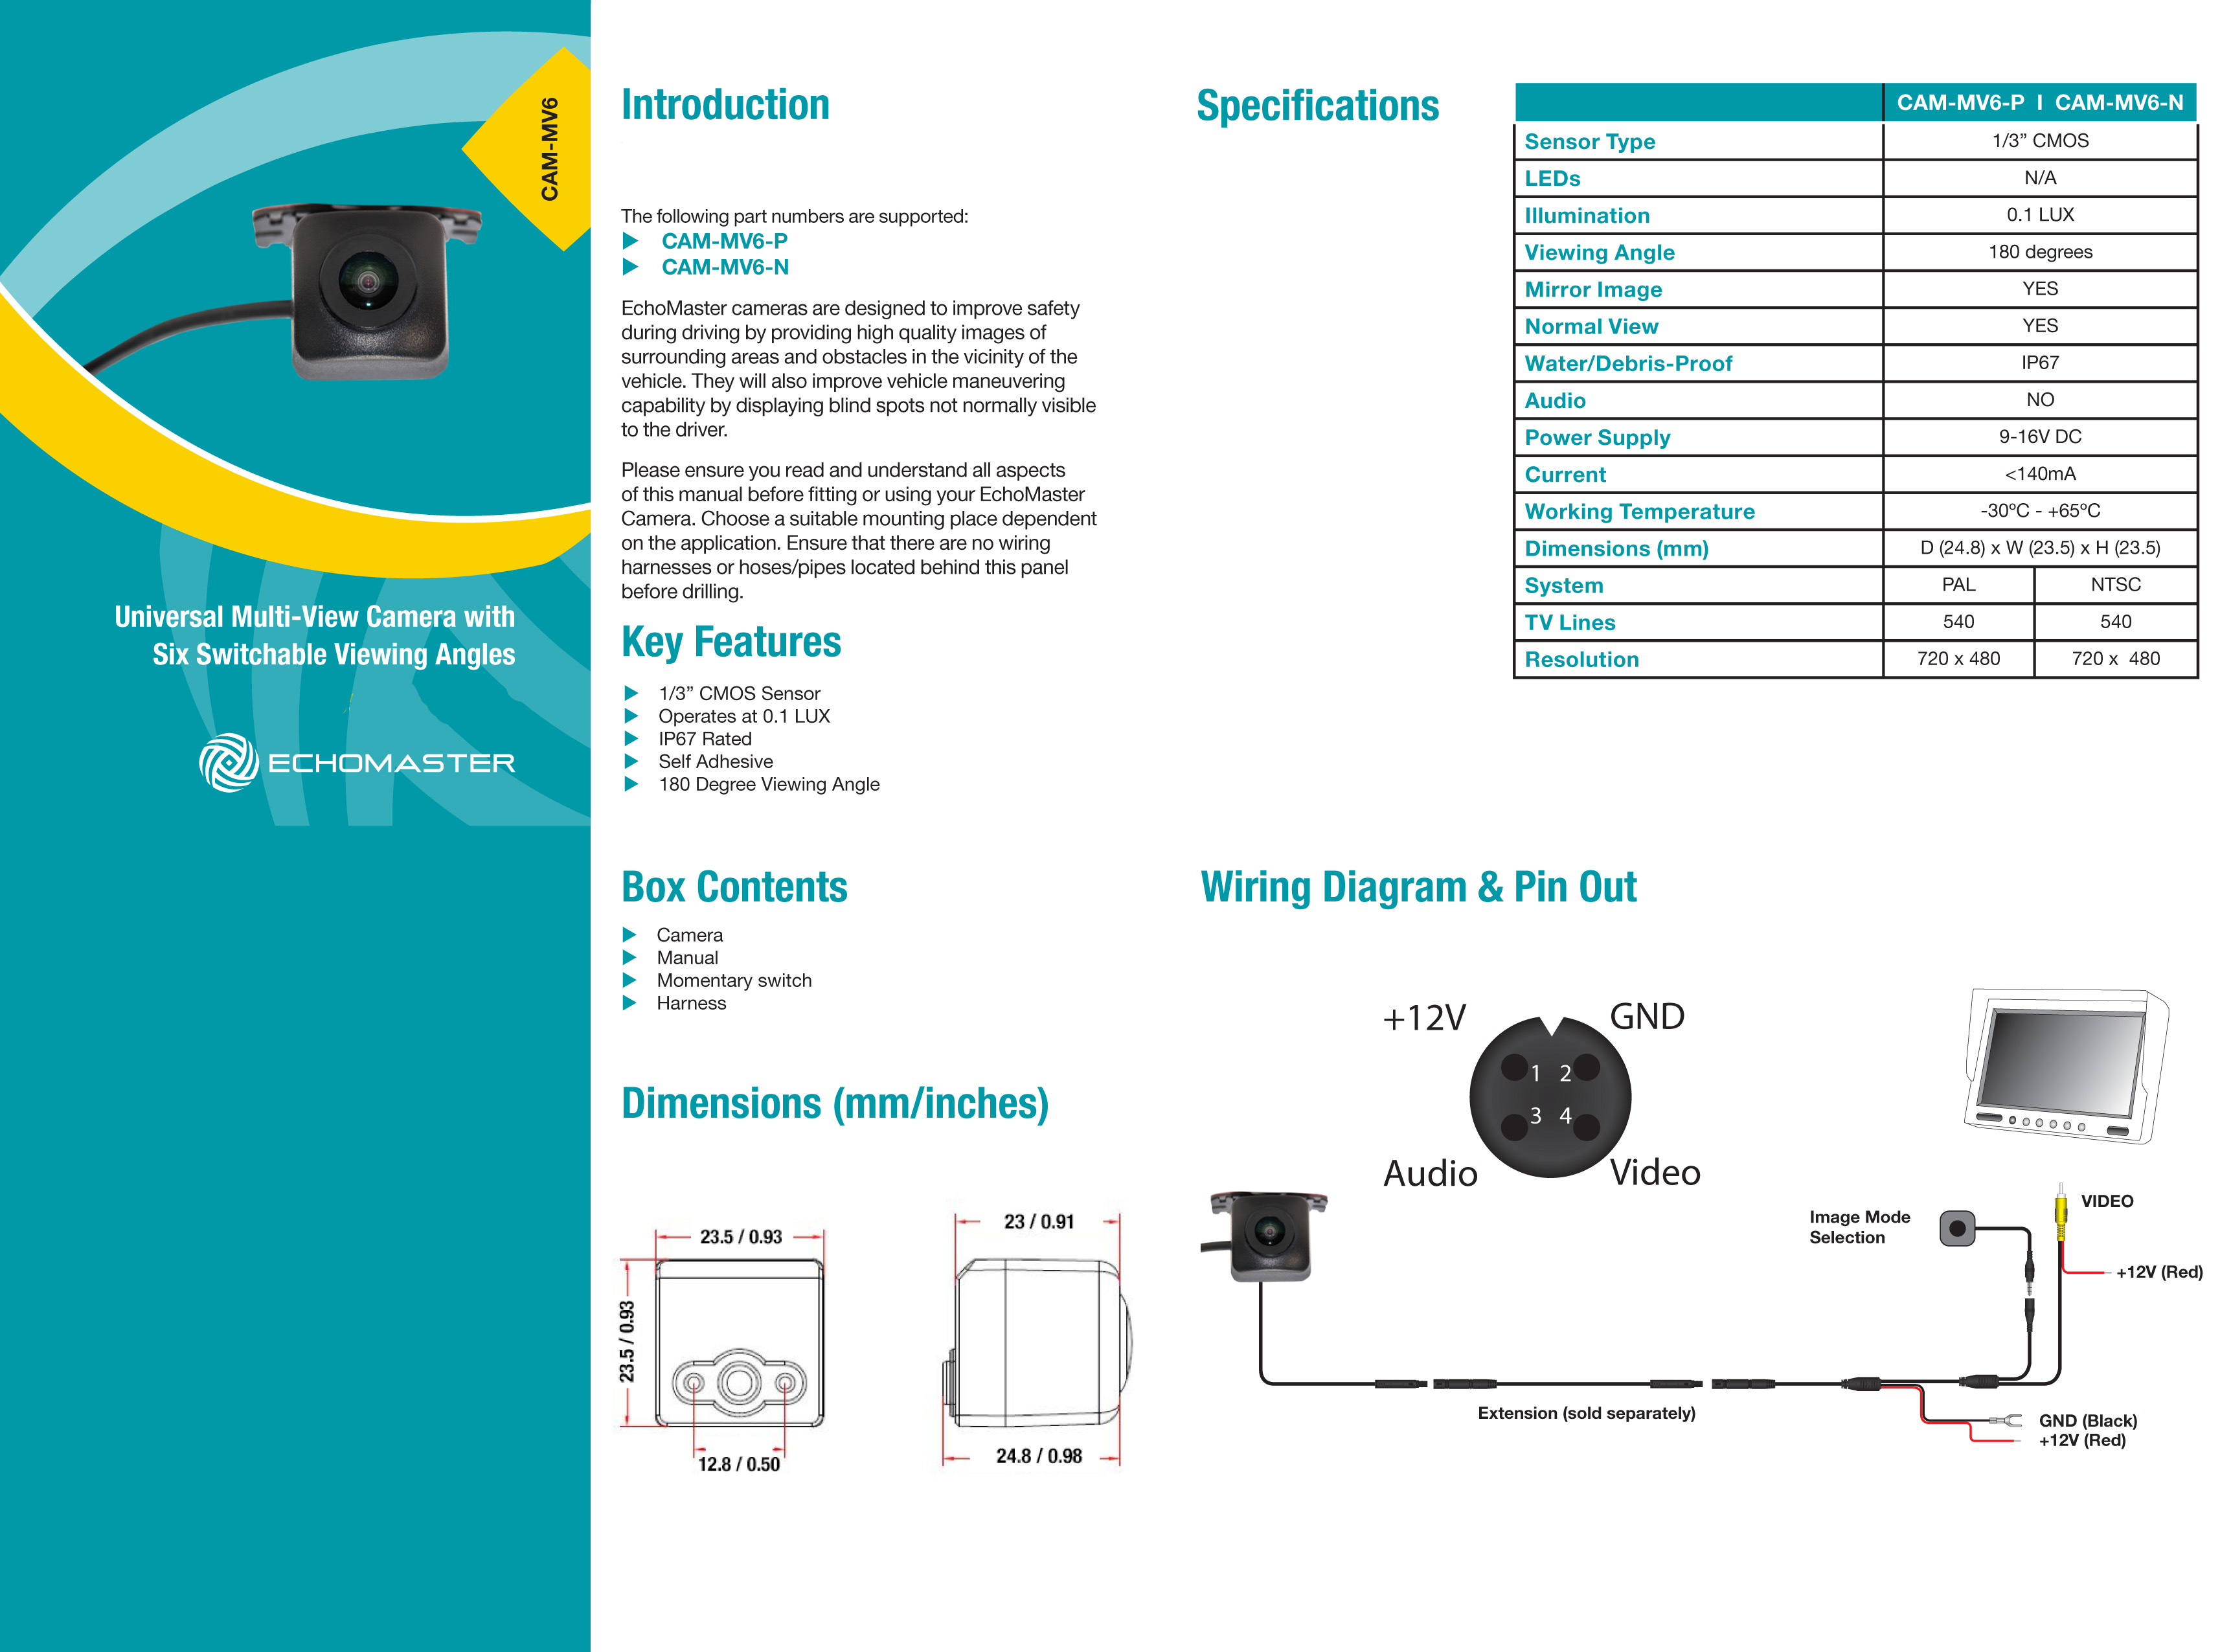 Echomaster Backup Camera Wiring Diagram from www.soundoftristate.com